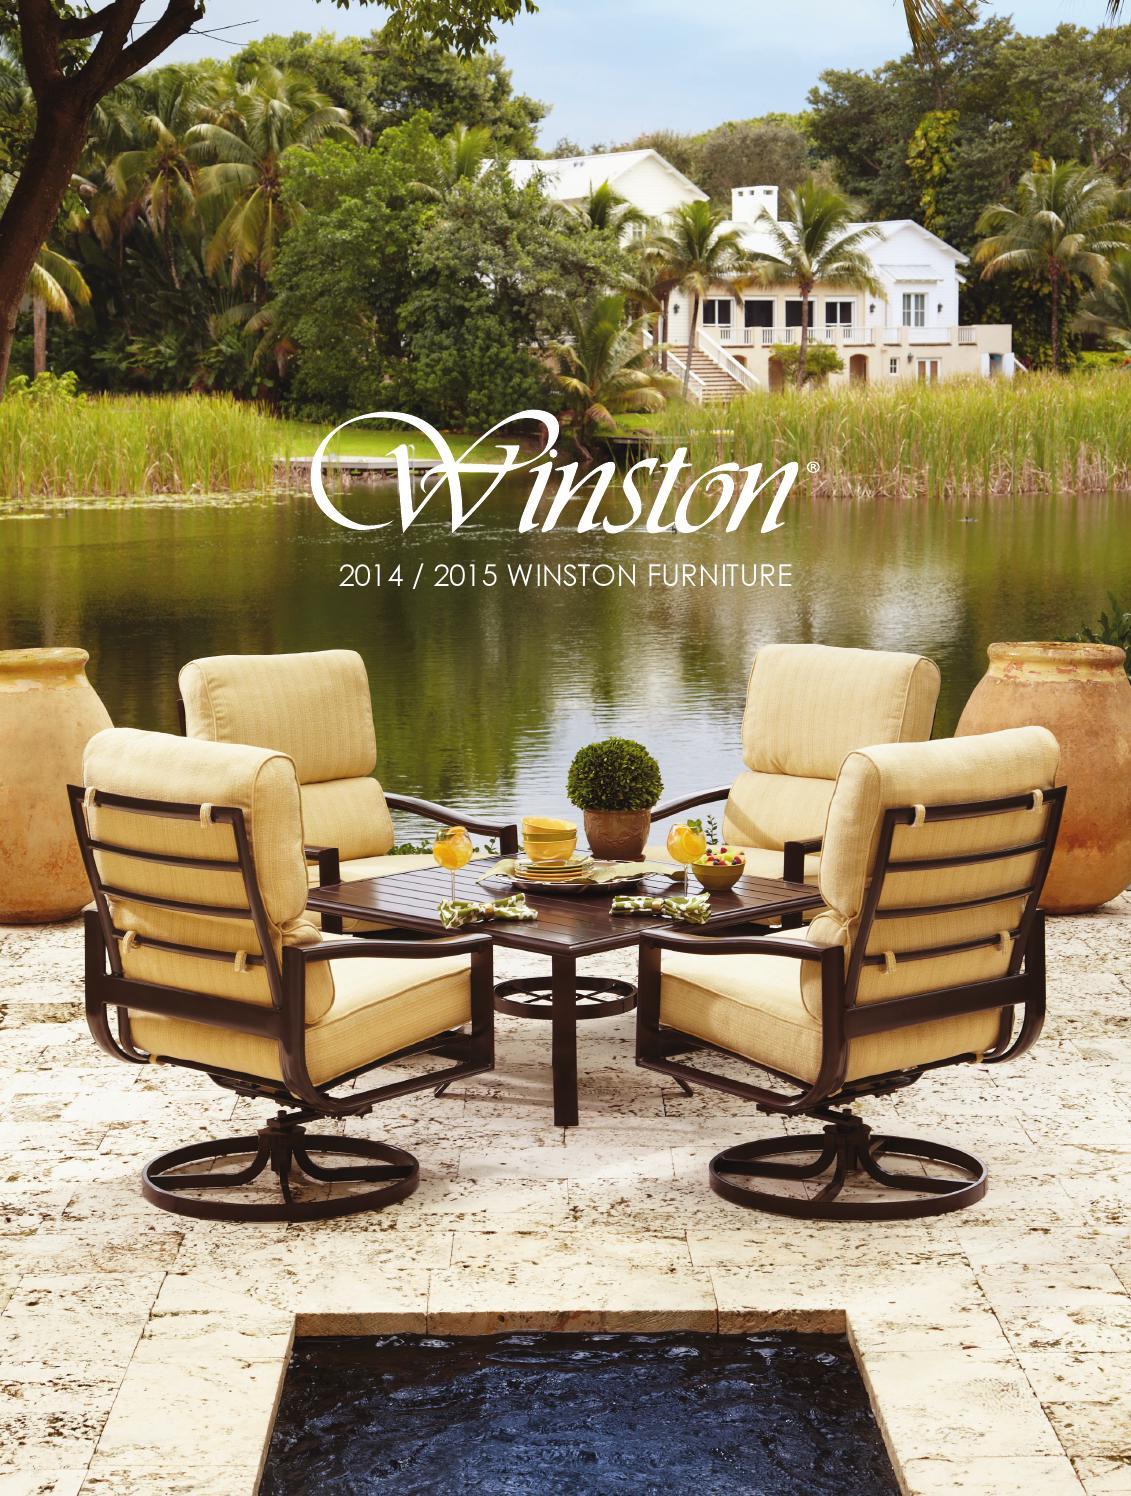 2017 Winston Furniture Catalog